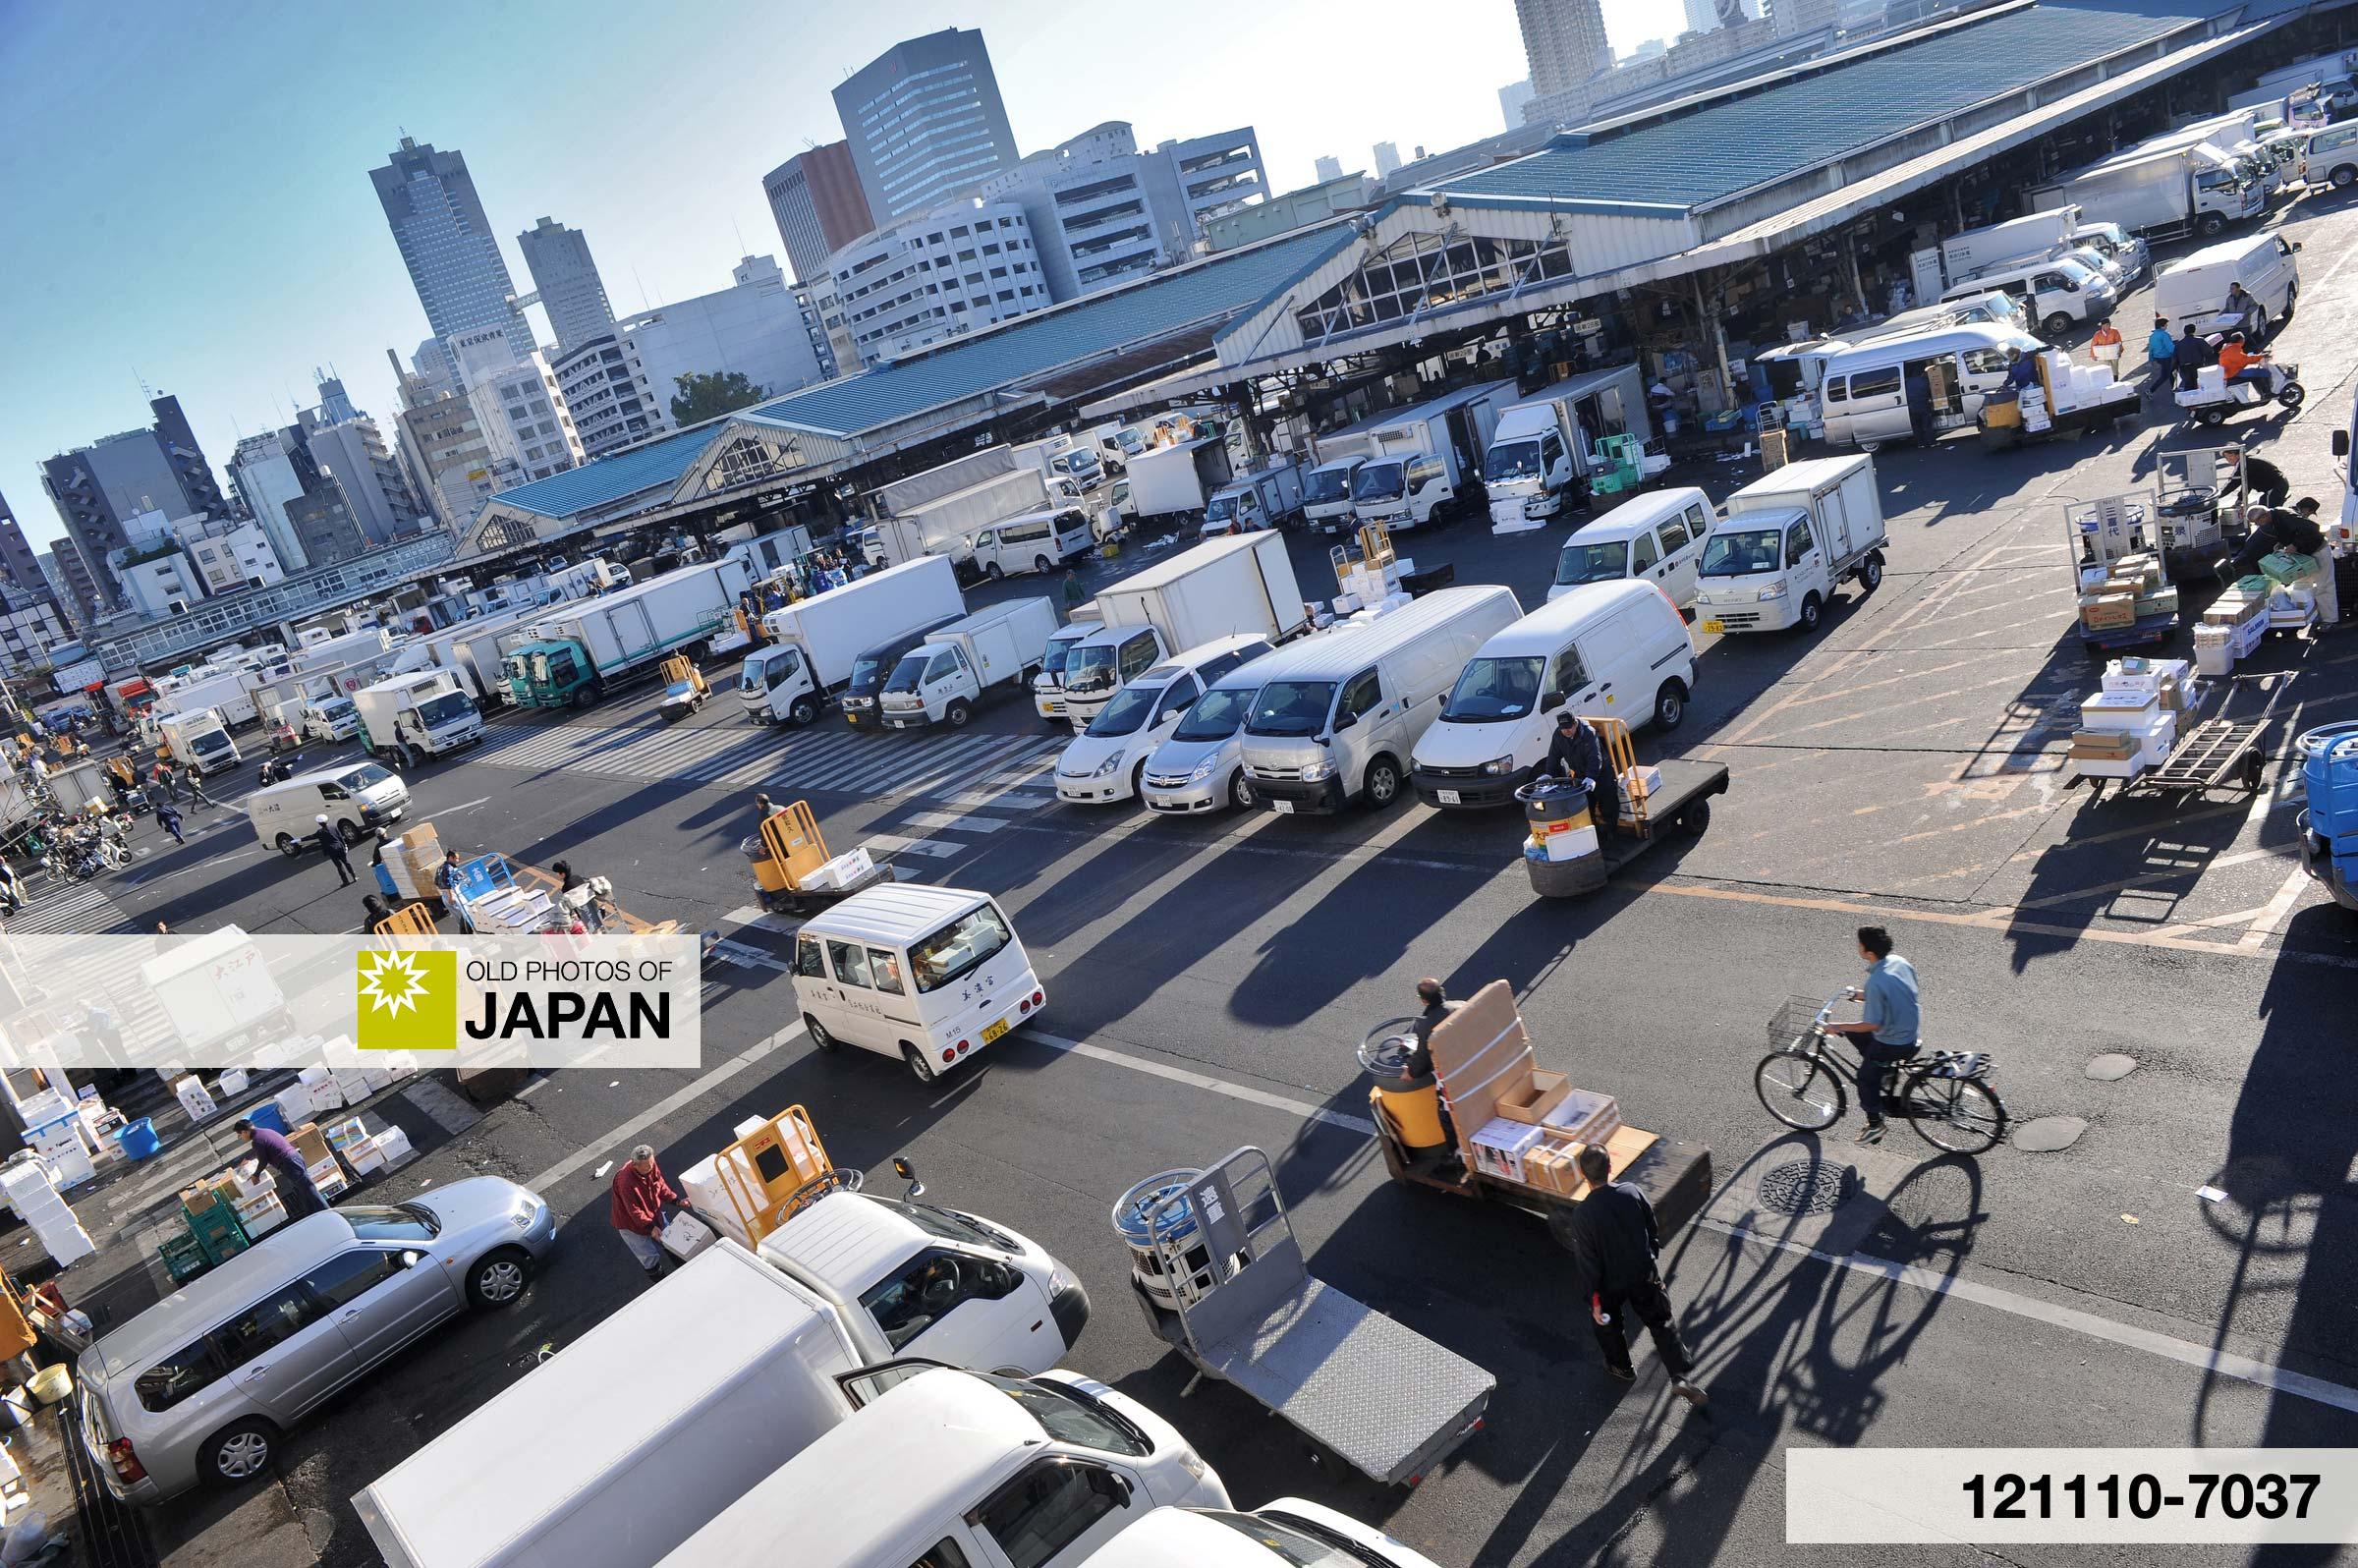 121110-7037 - The fish market in Tsukiji, Tokyo